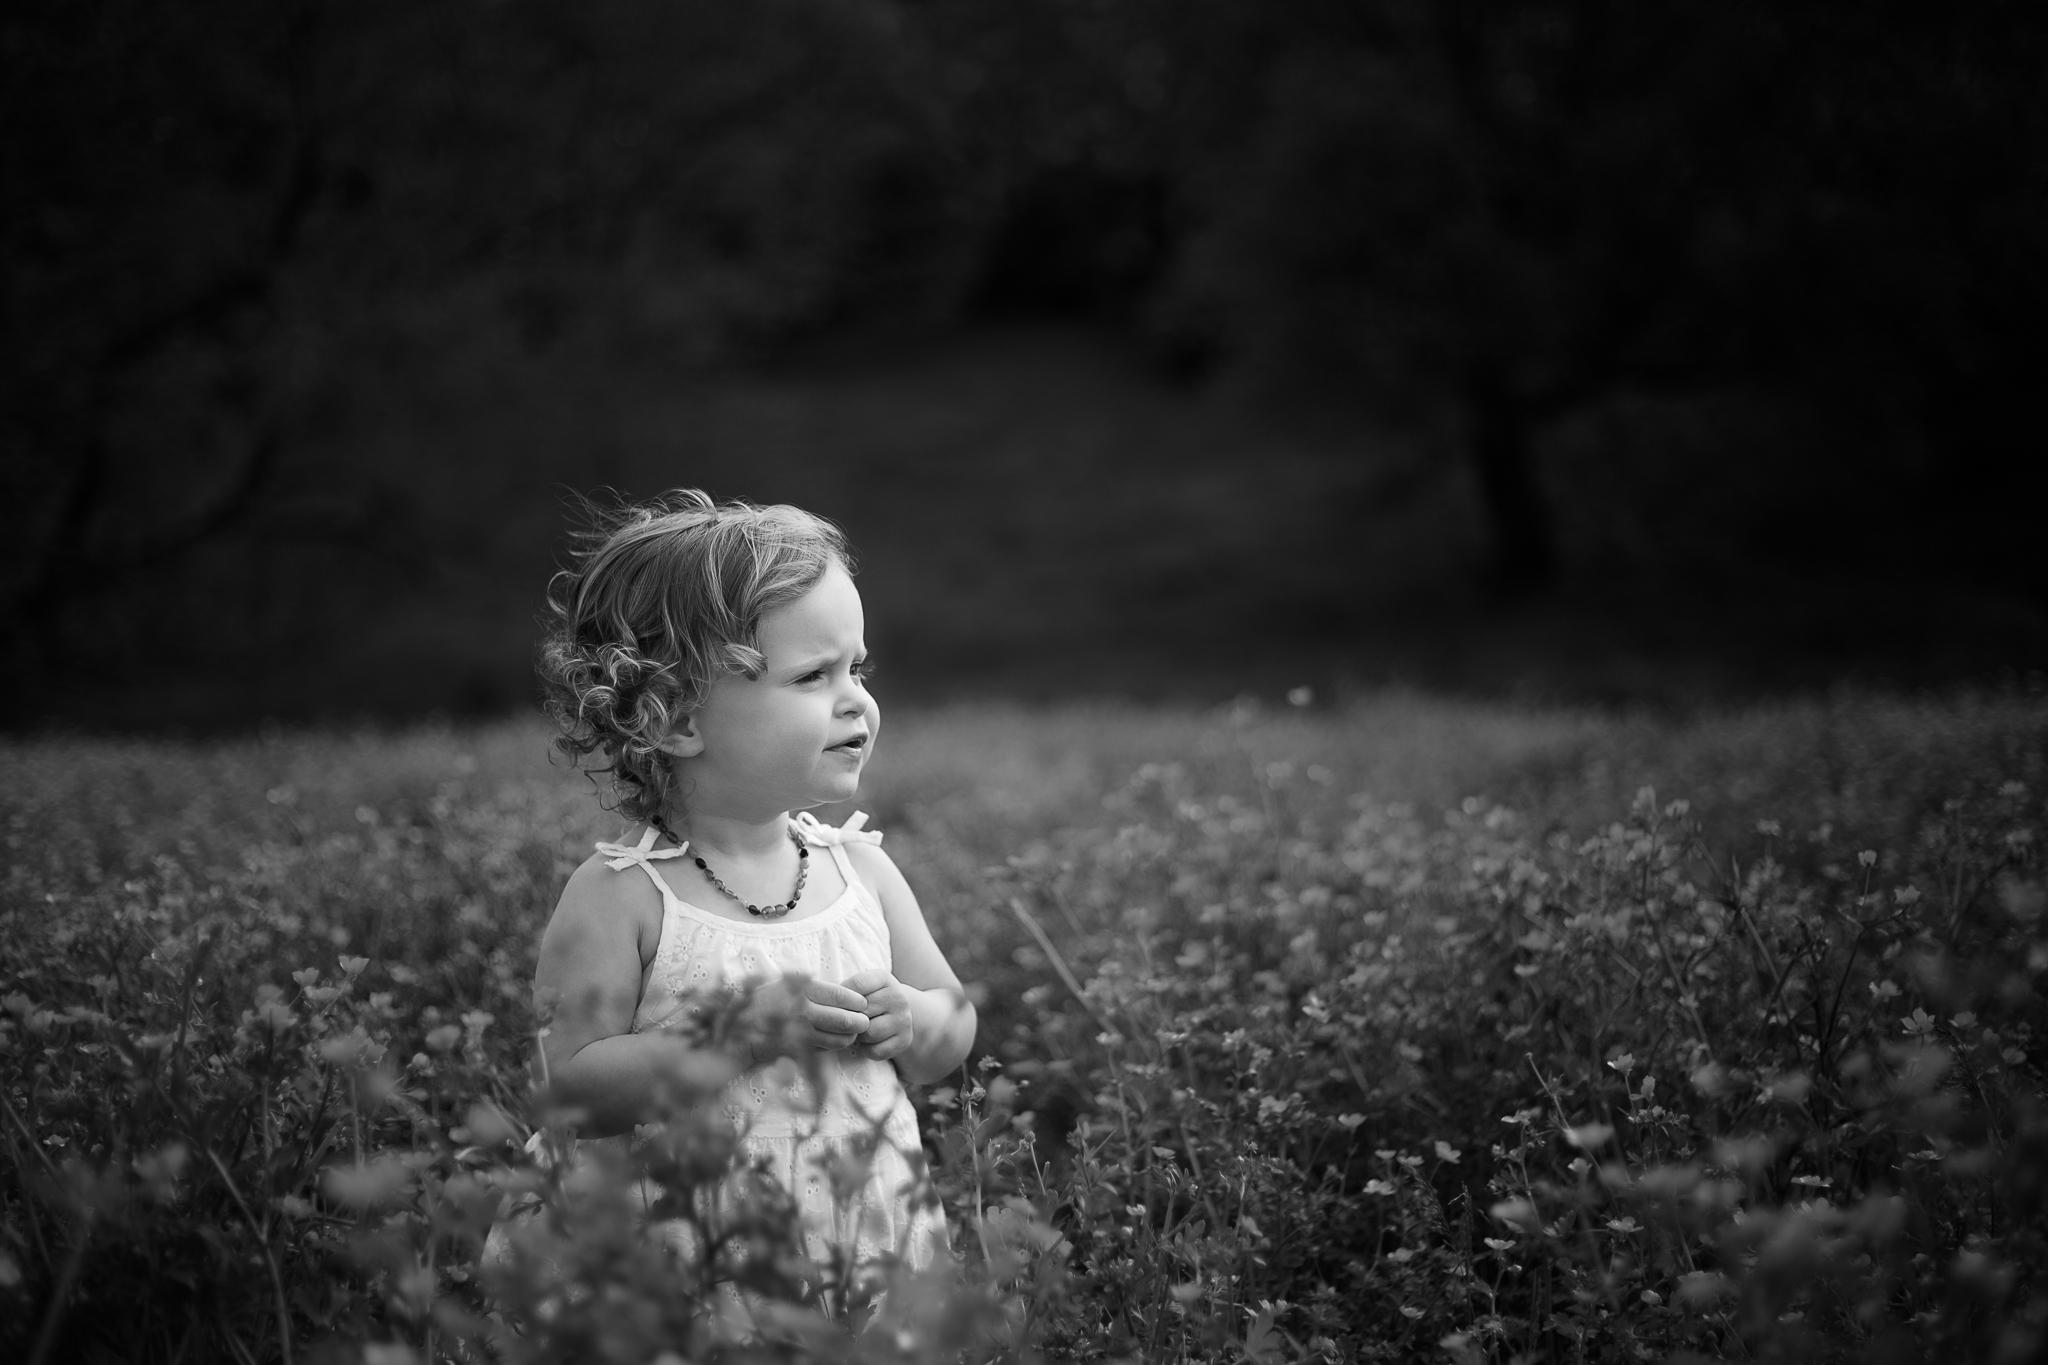 Ellee in flower field, Knoxville children's photographer